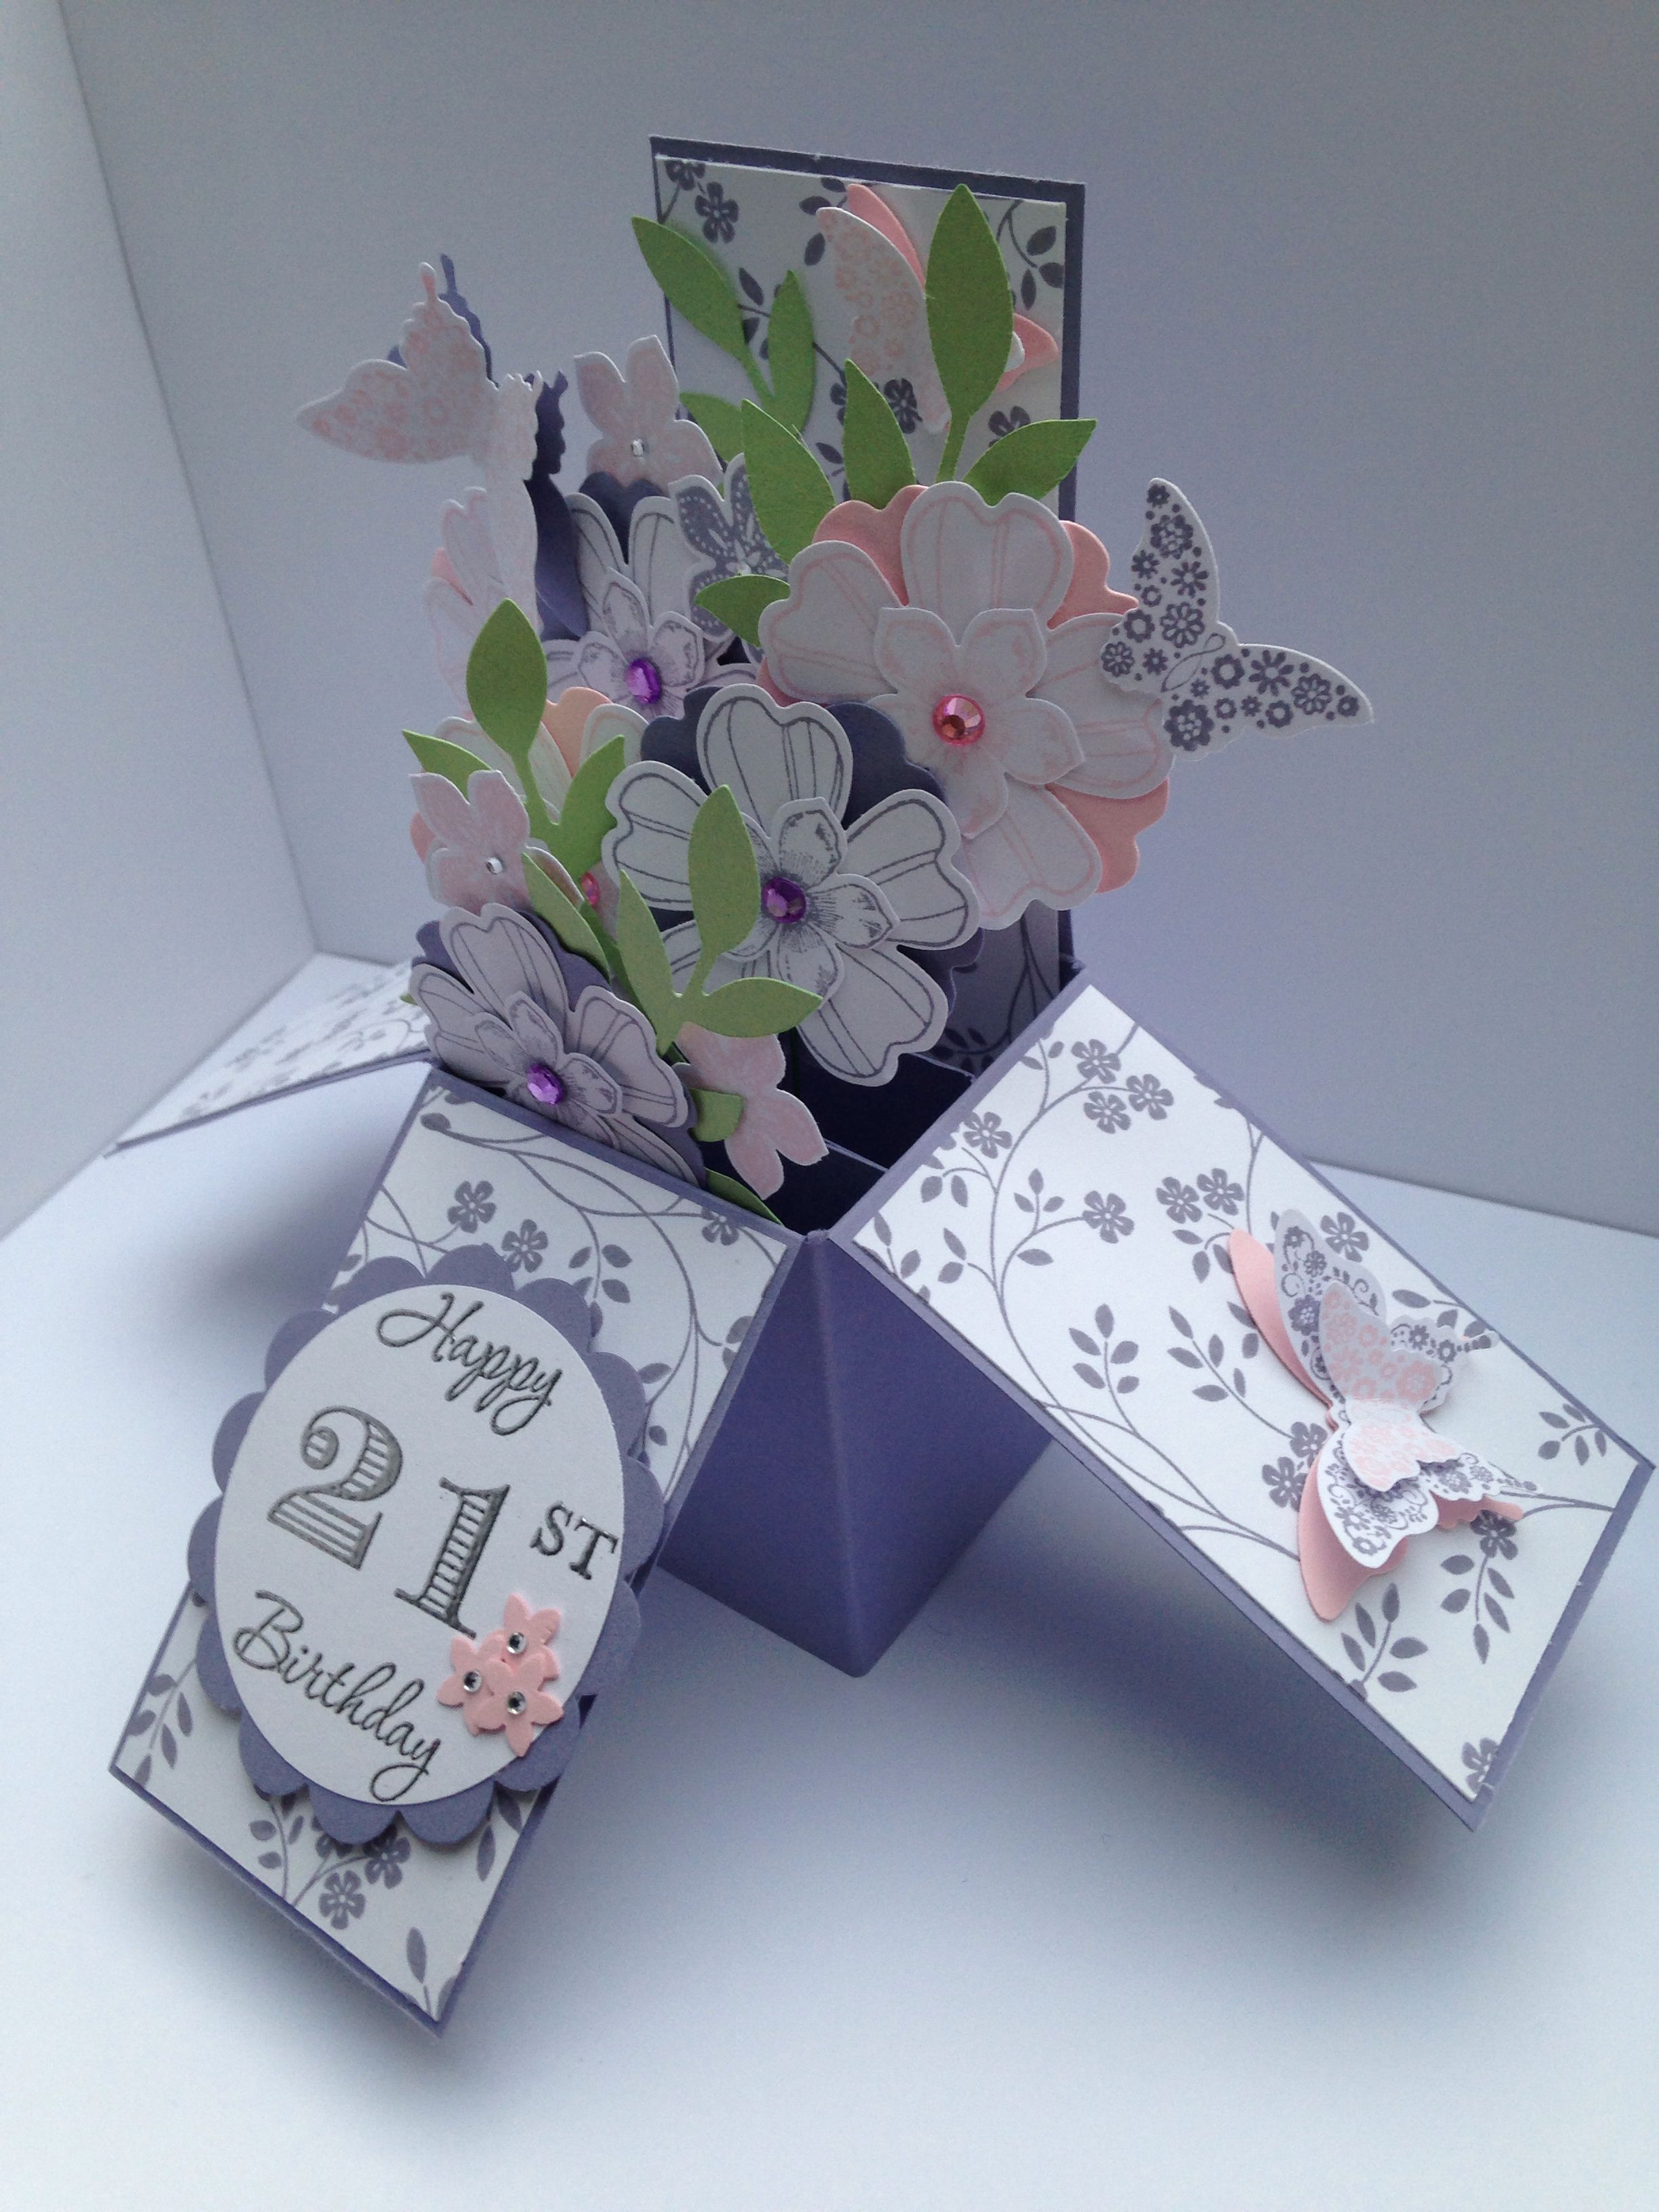 21st Birthday Card 21st Birthday Cards Cards Handmade Beautiful Handmade Cards